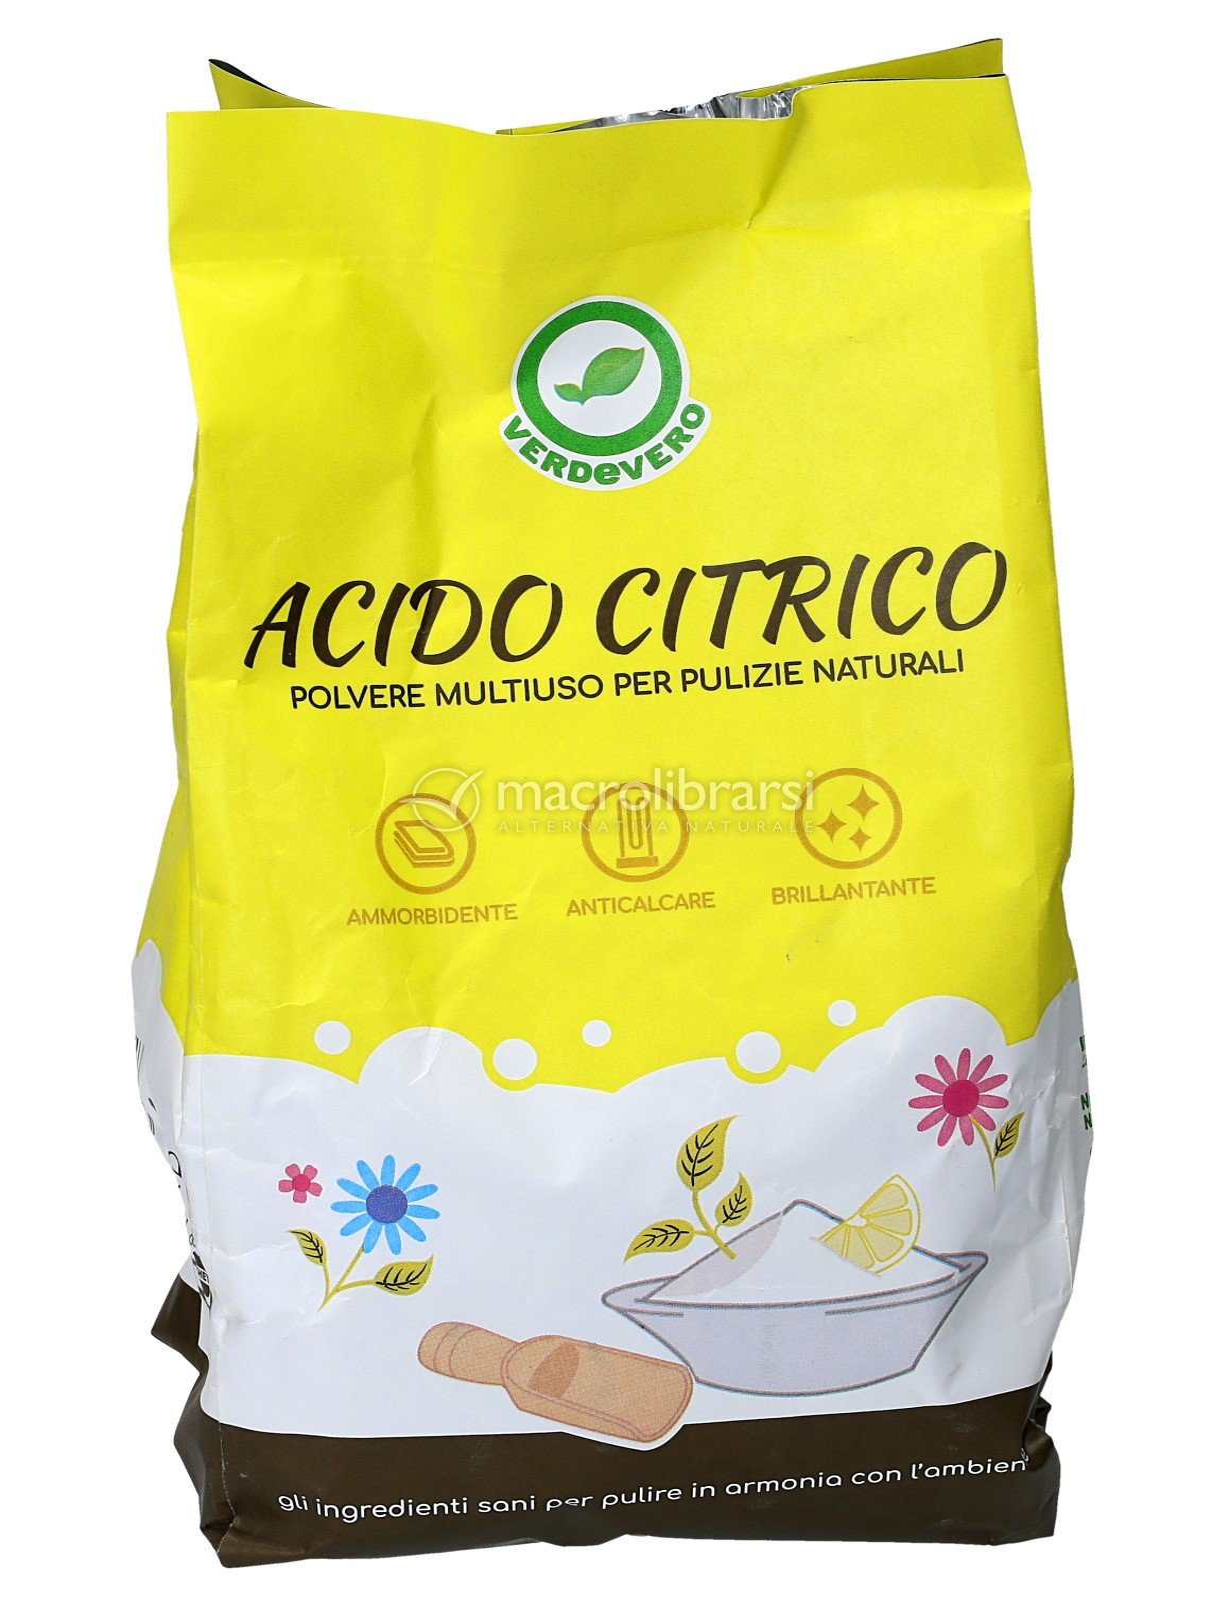 Acido Citrico Dosi Alimentari acido citrico - busta